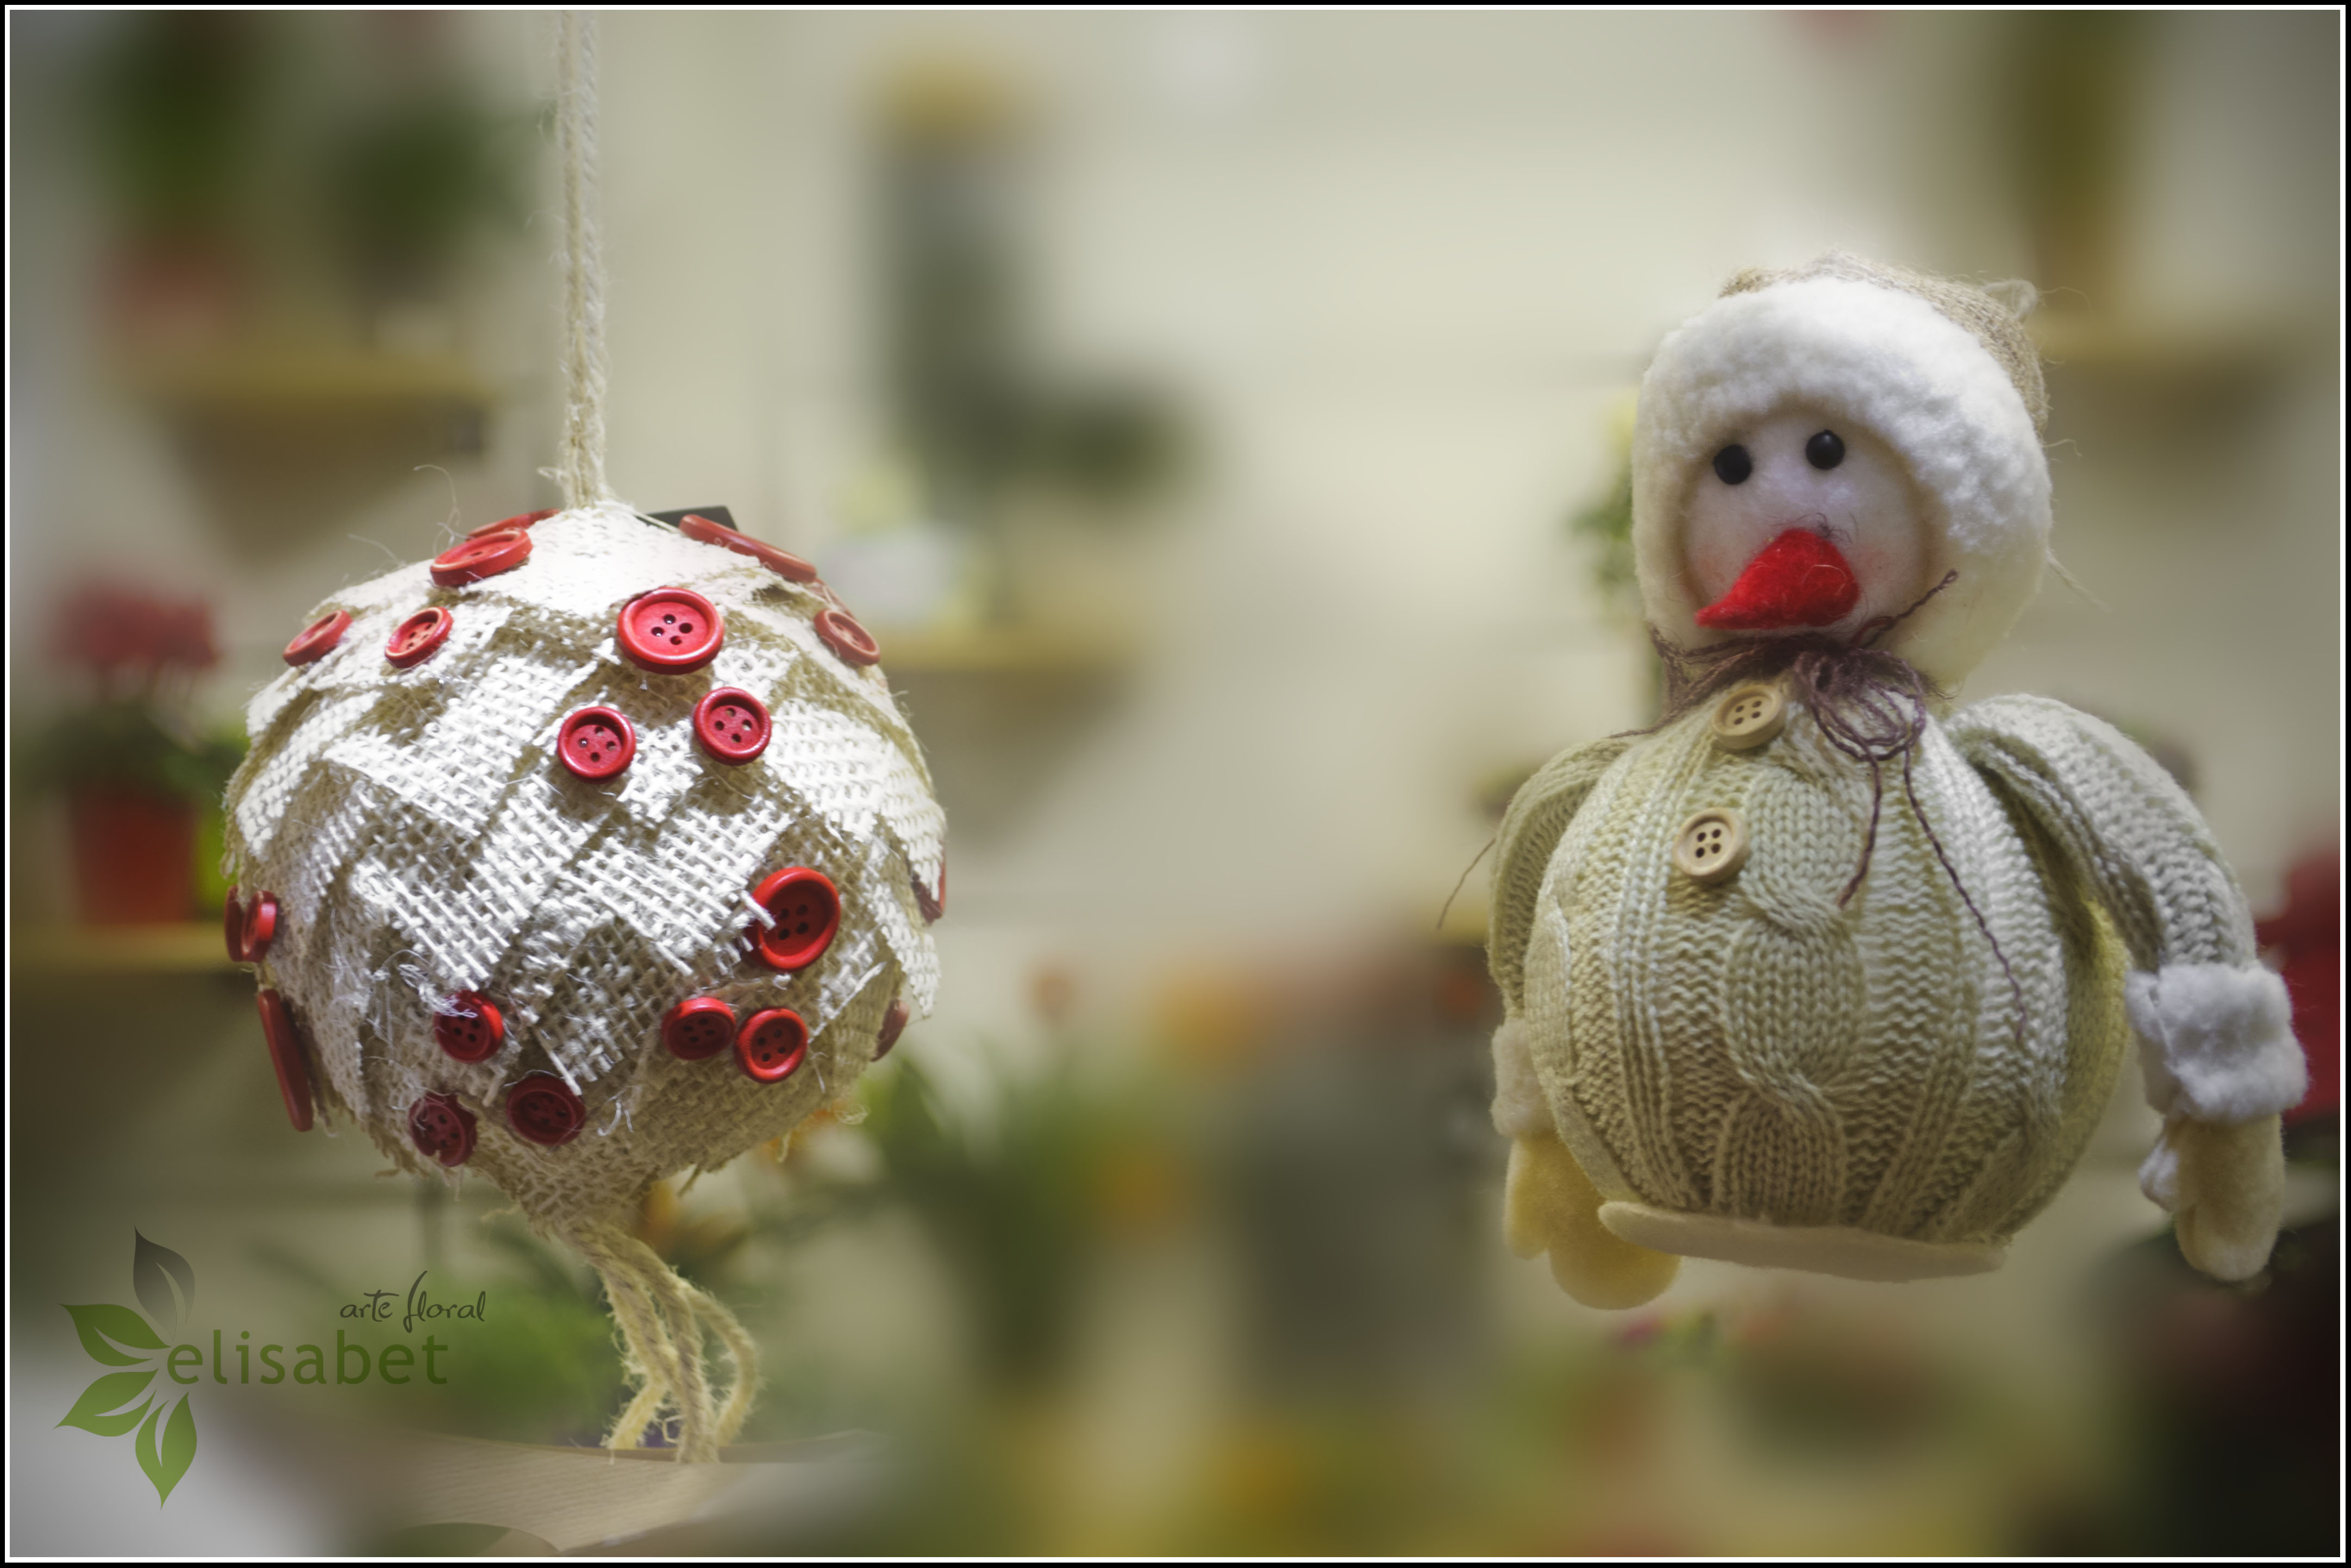 Navidad elisabet arte floral blog - Adornos navidenos 2014 ...